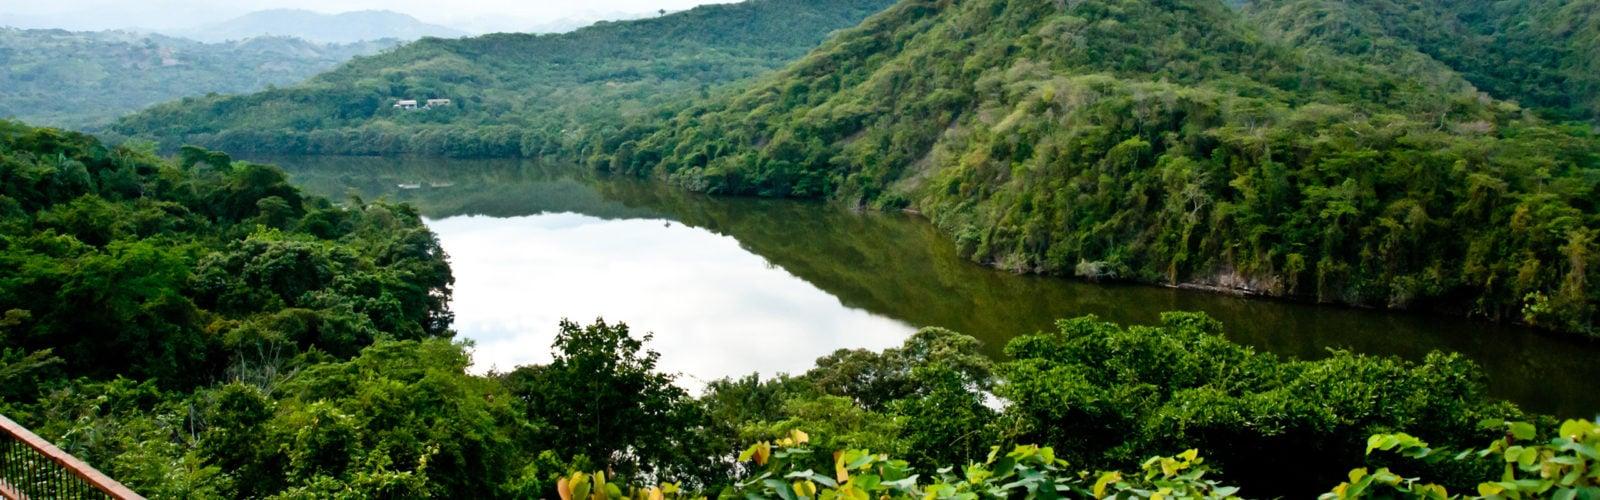 colombia-amazon